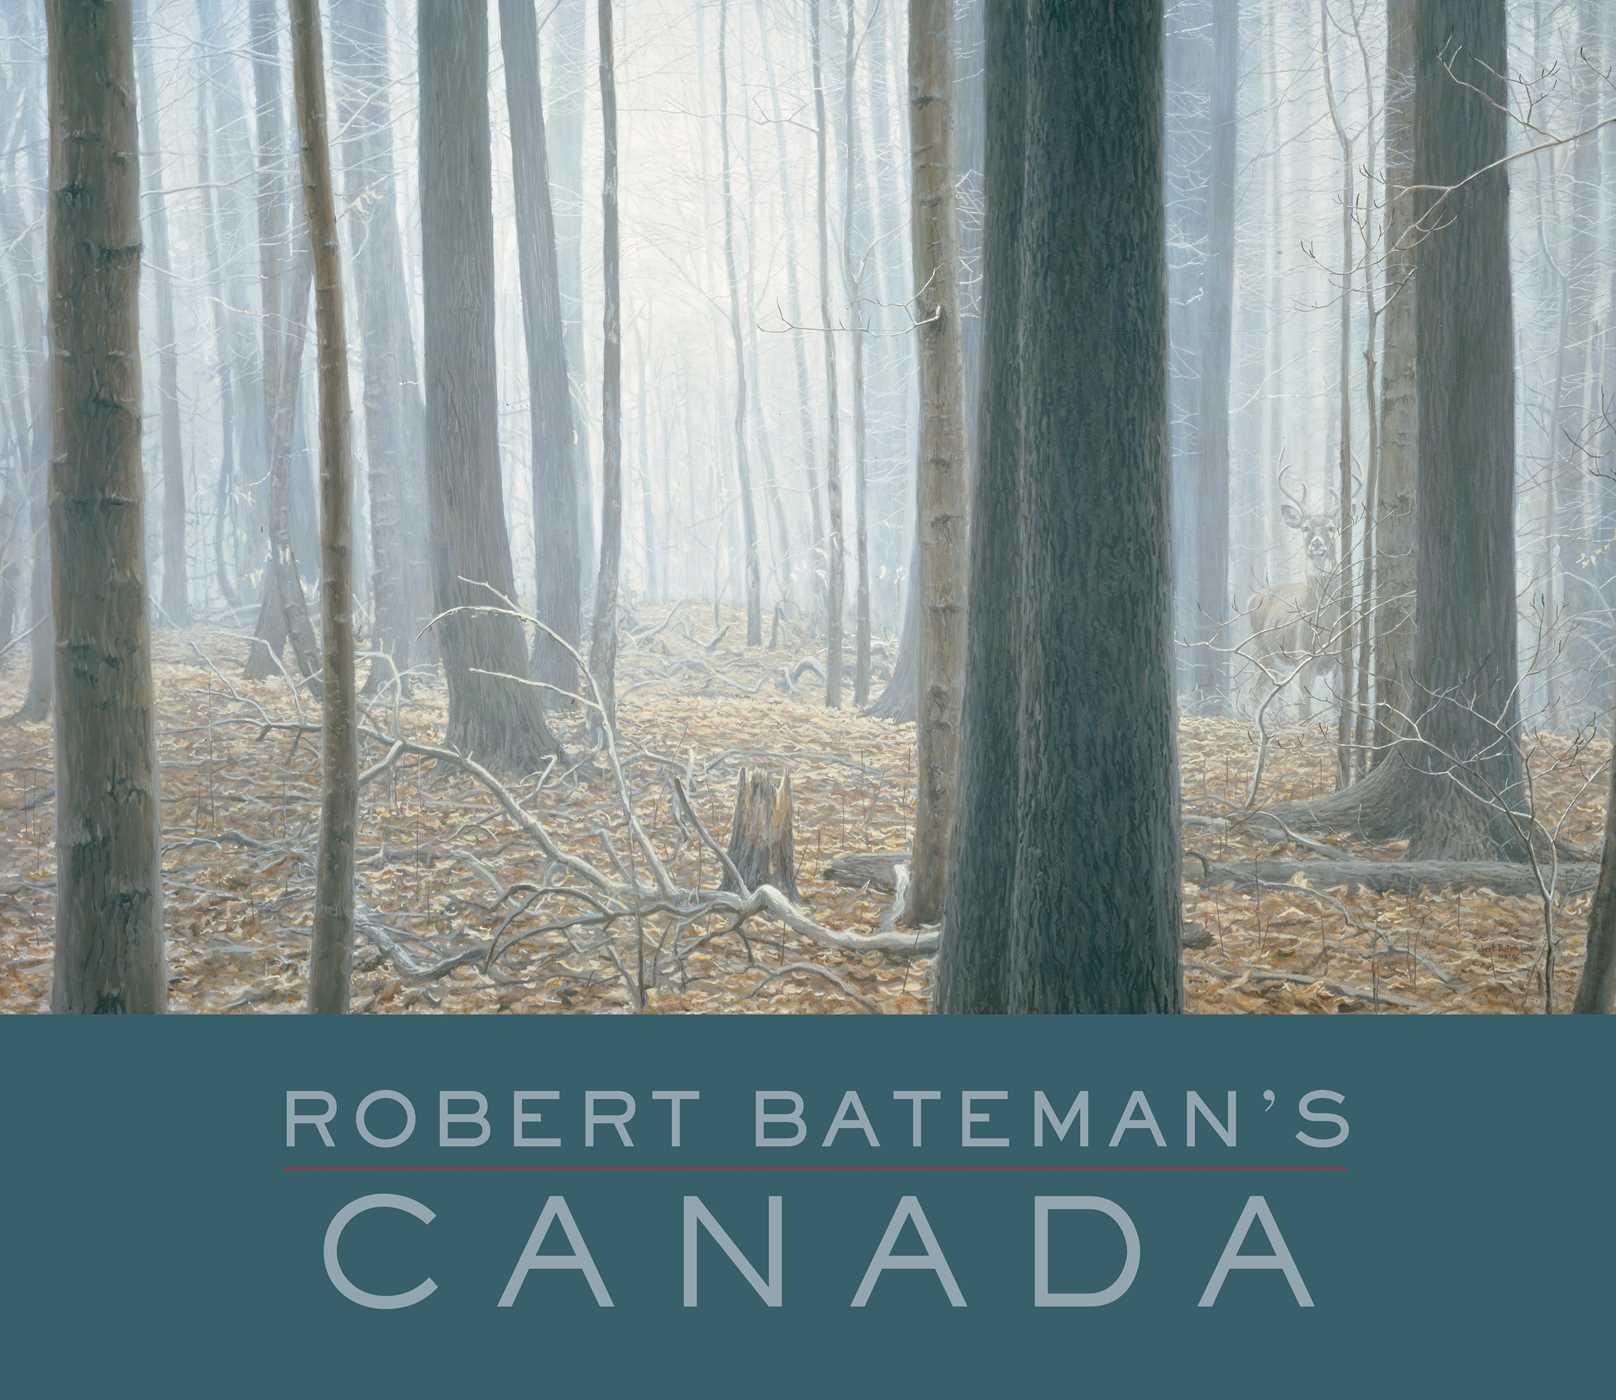 Robert batemans canada 9781501163432 hr